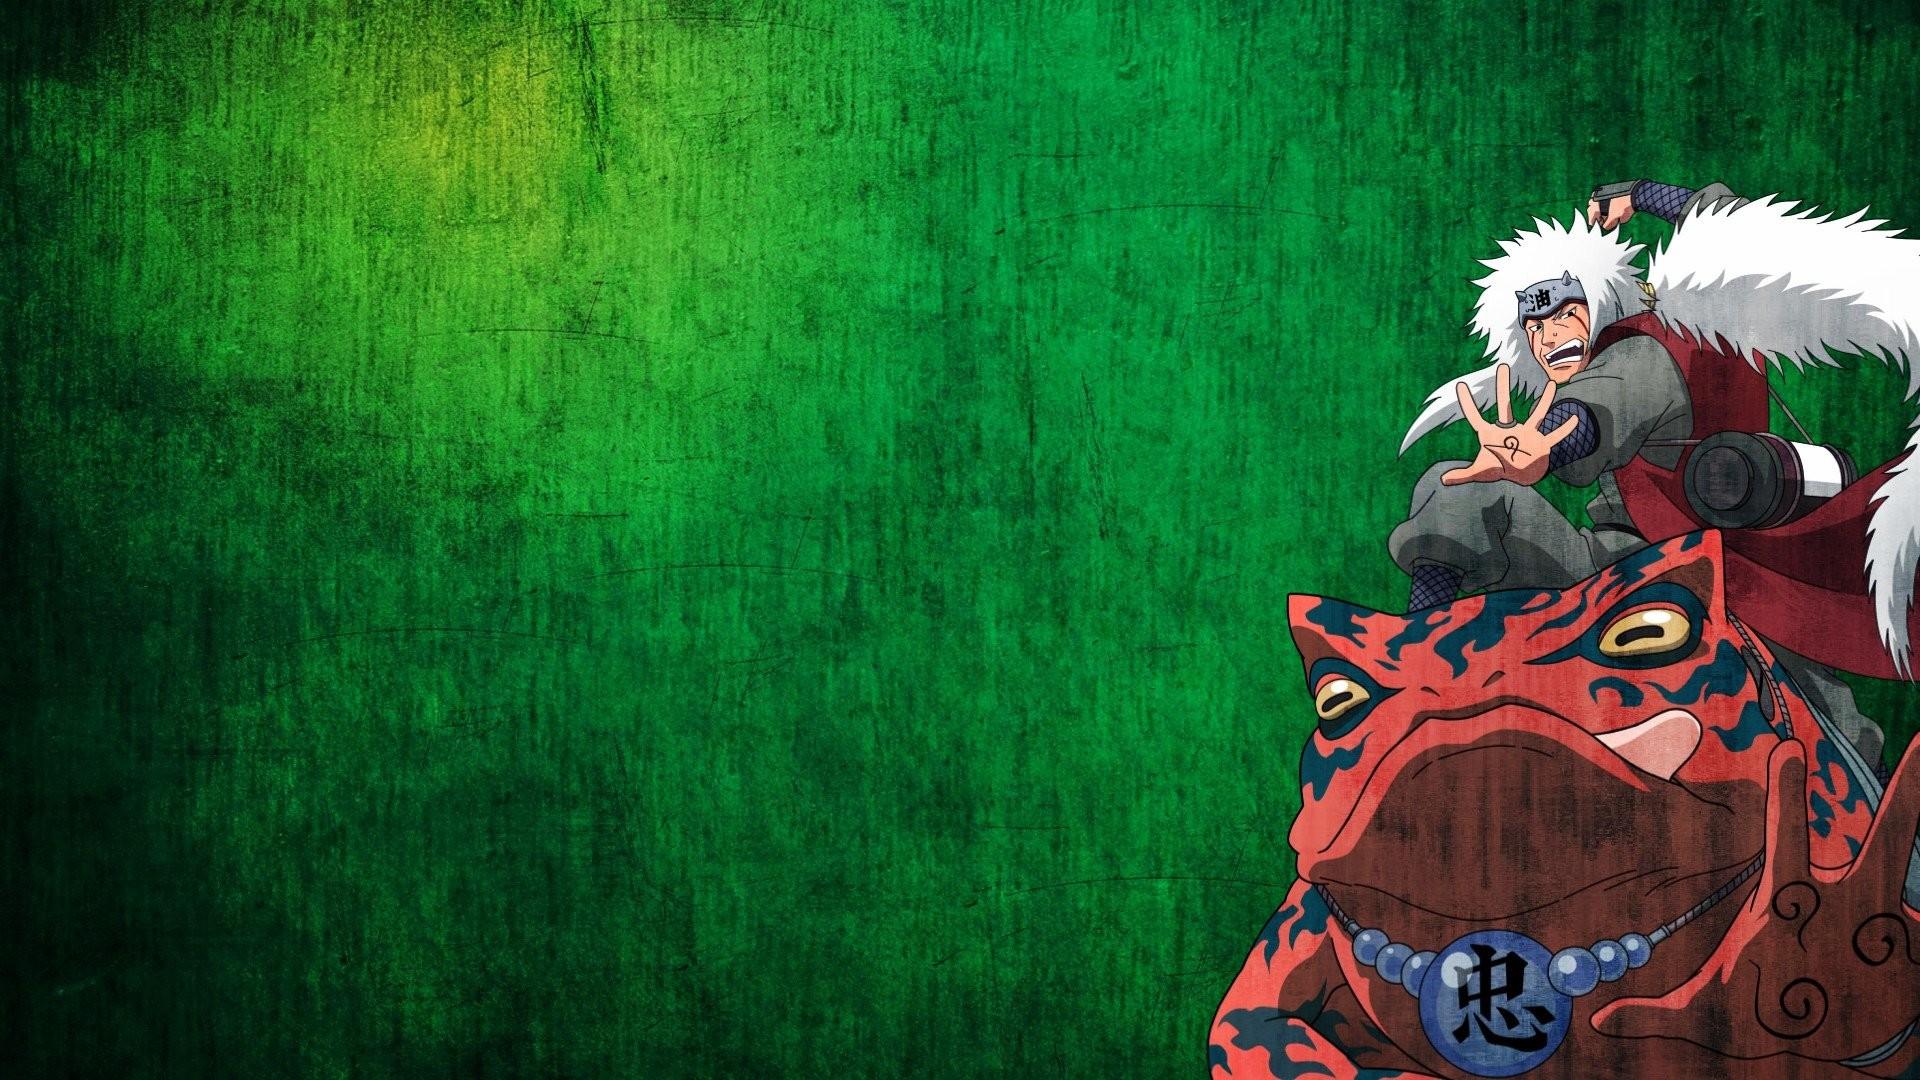 Jiraiya wallpaper 49 images - Wallpaper hd 1920x1080 anime ...